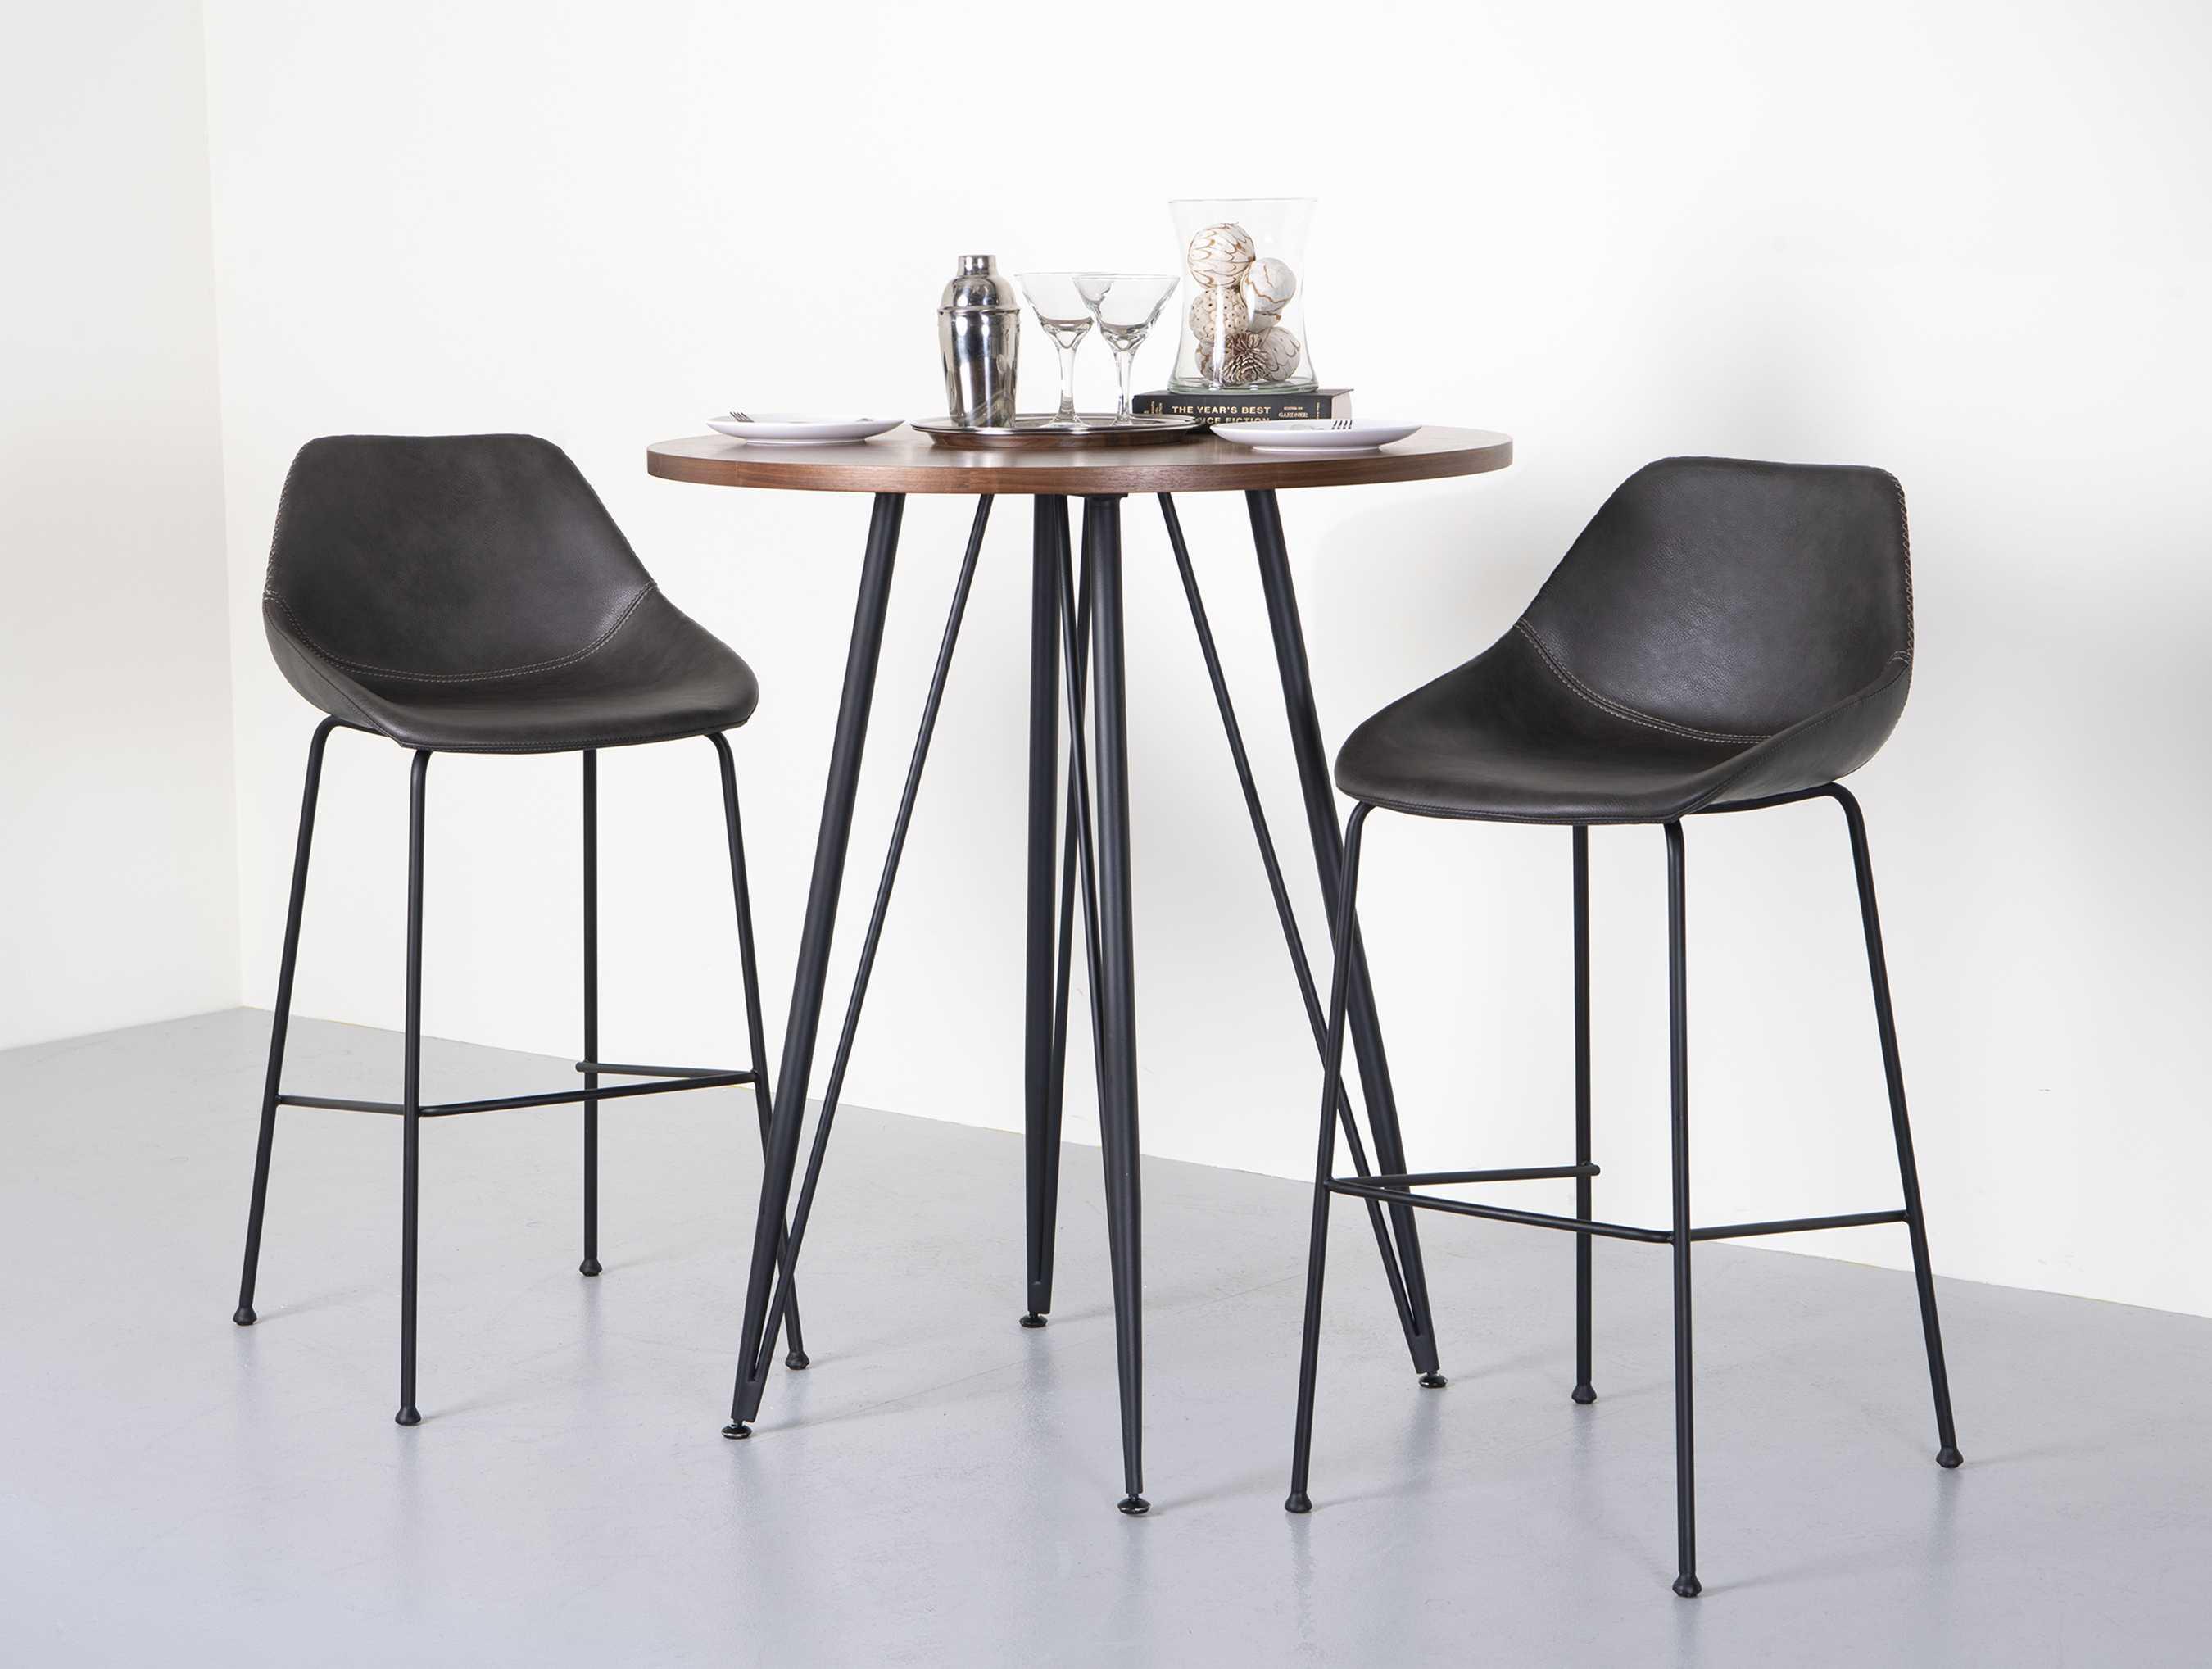 FINE LIVING - Contemporary Designed Furniture